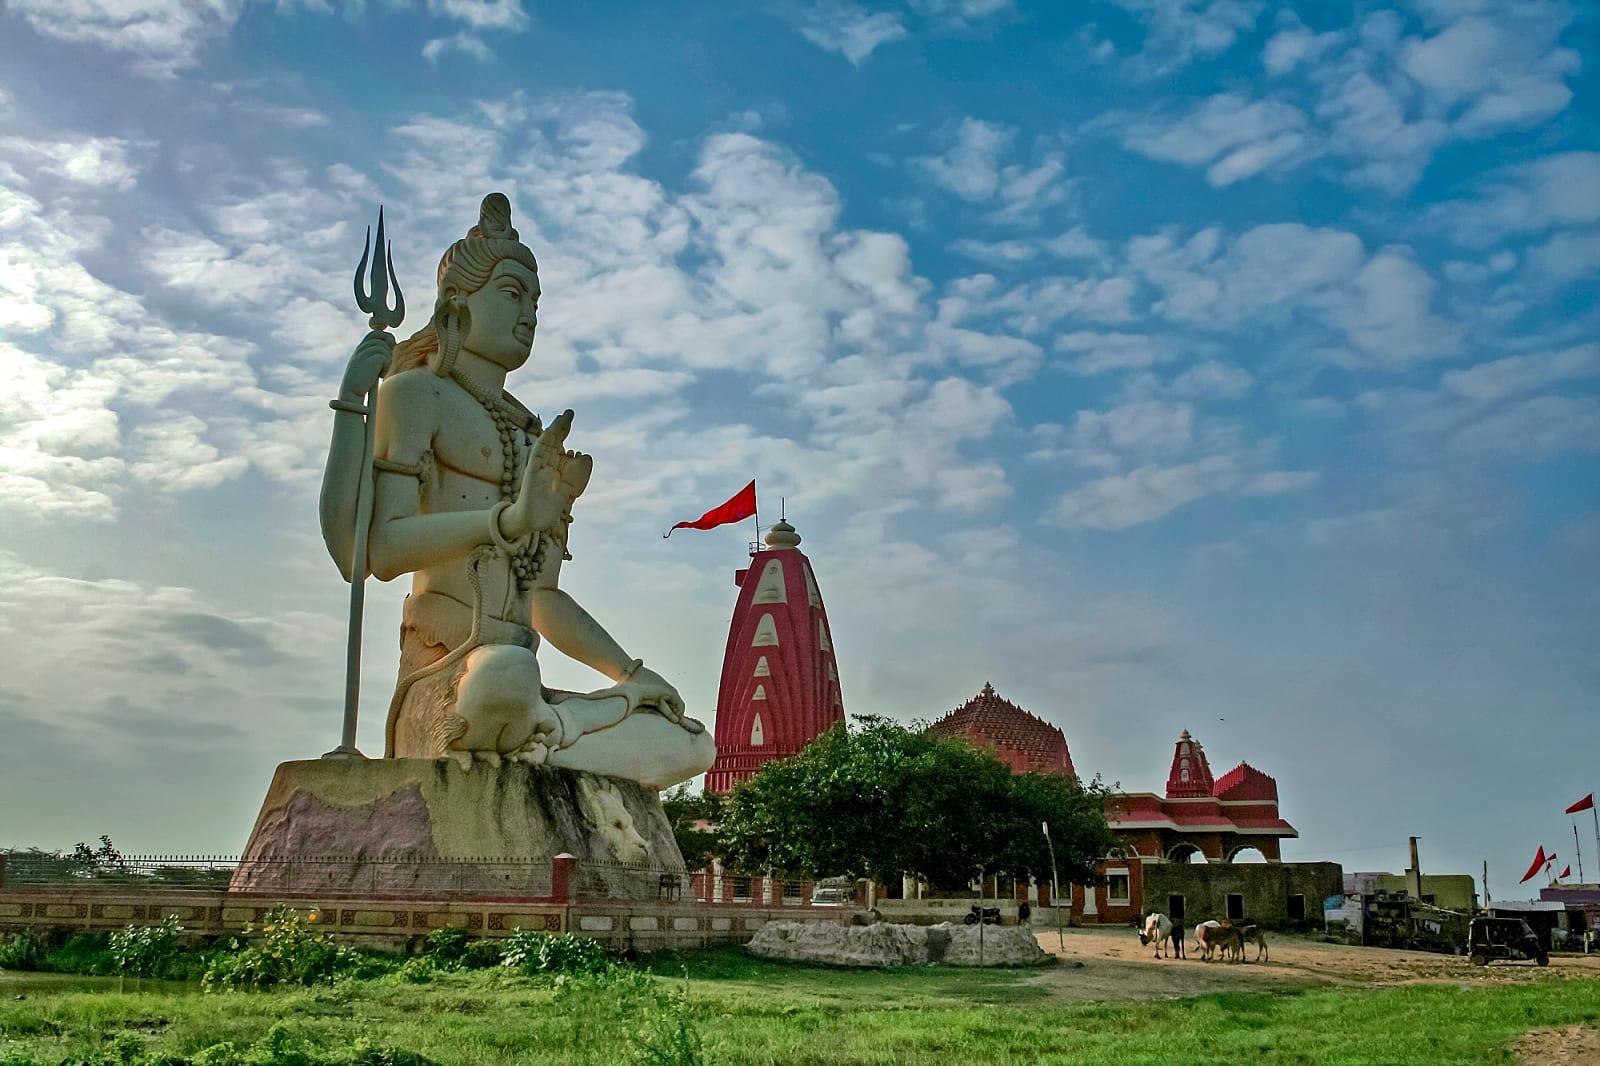 Gujarat and Madhya Pradesh 4 Jyotirlinga with Dwarka from Ahmedabad